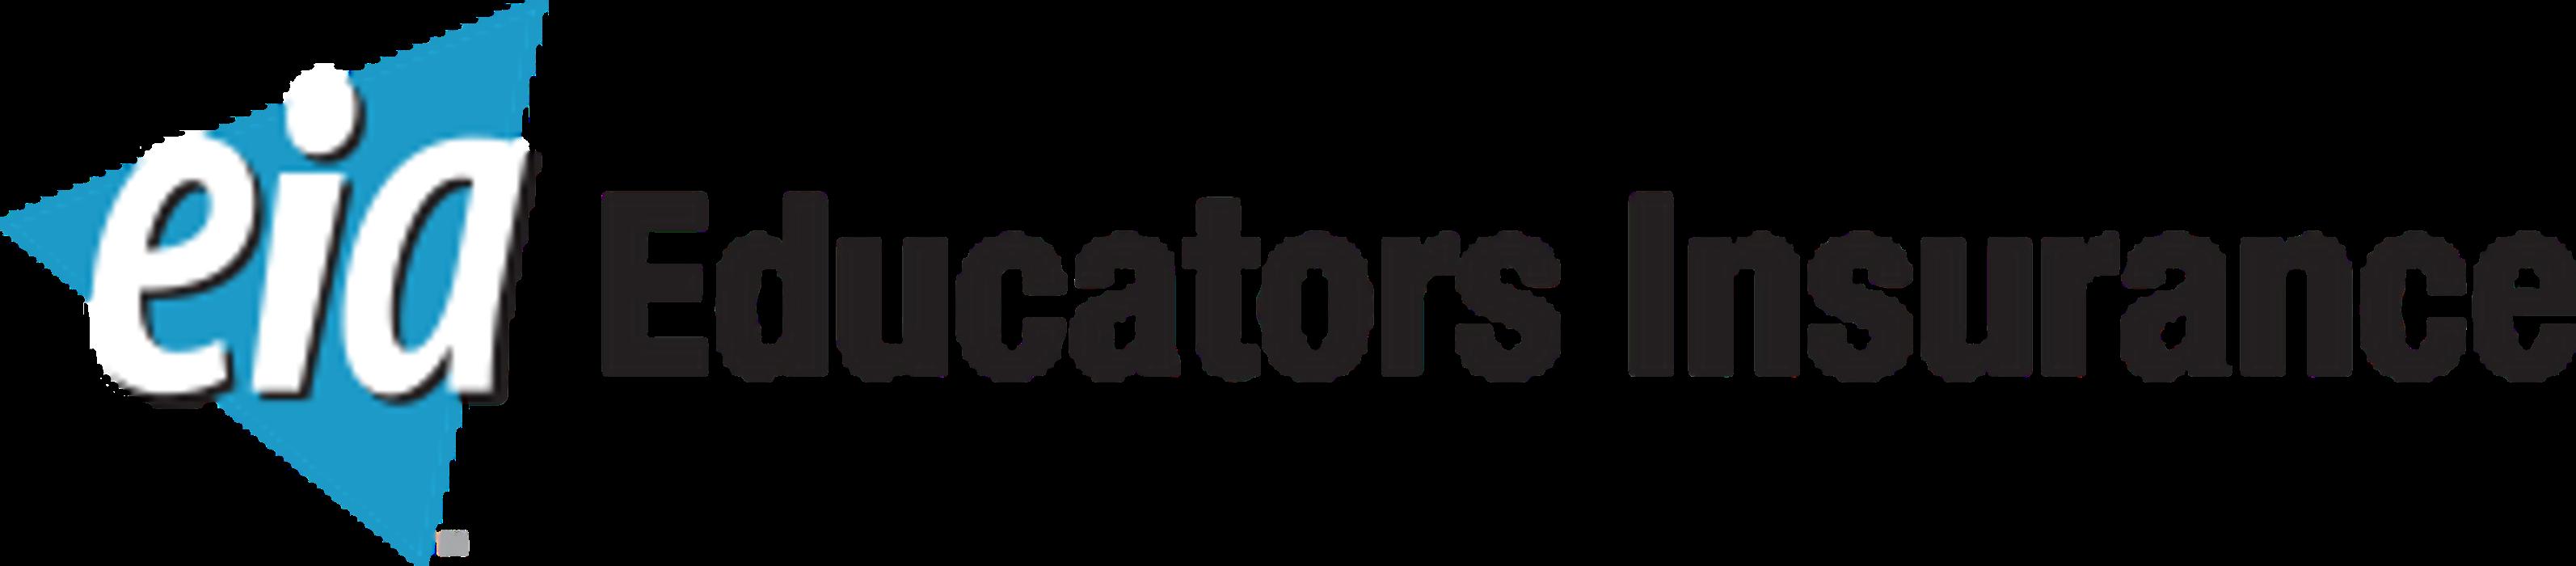 Educators Insurance - Worcester, MA